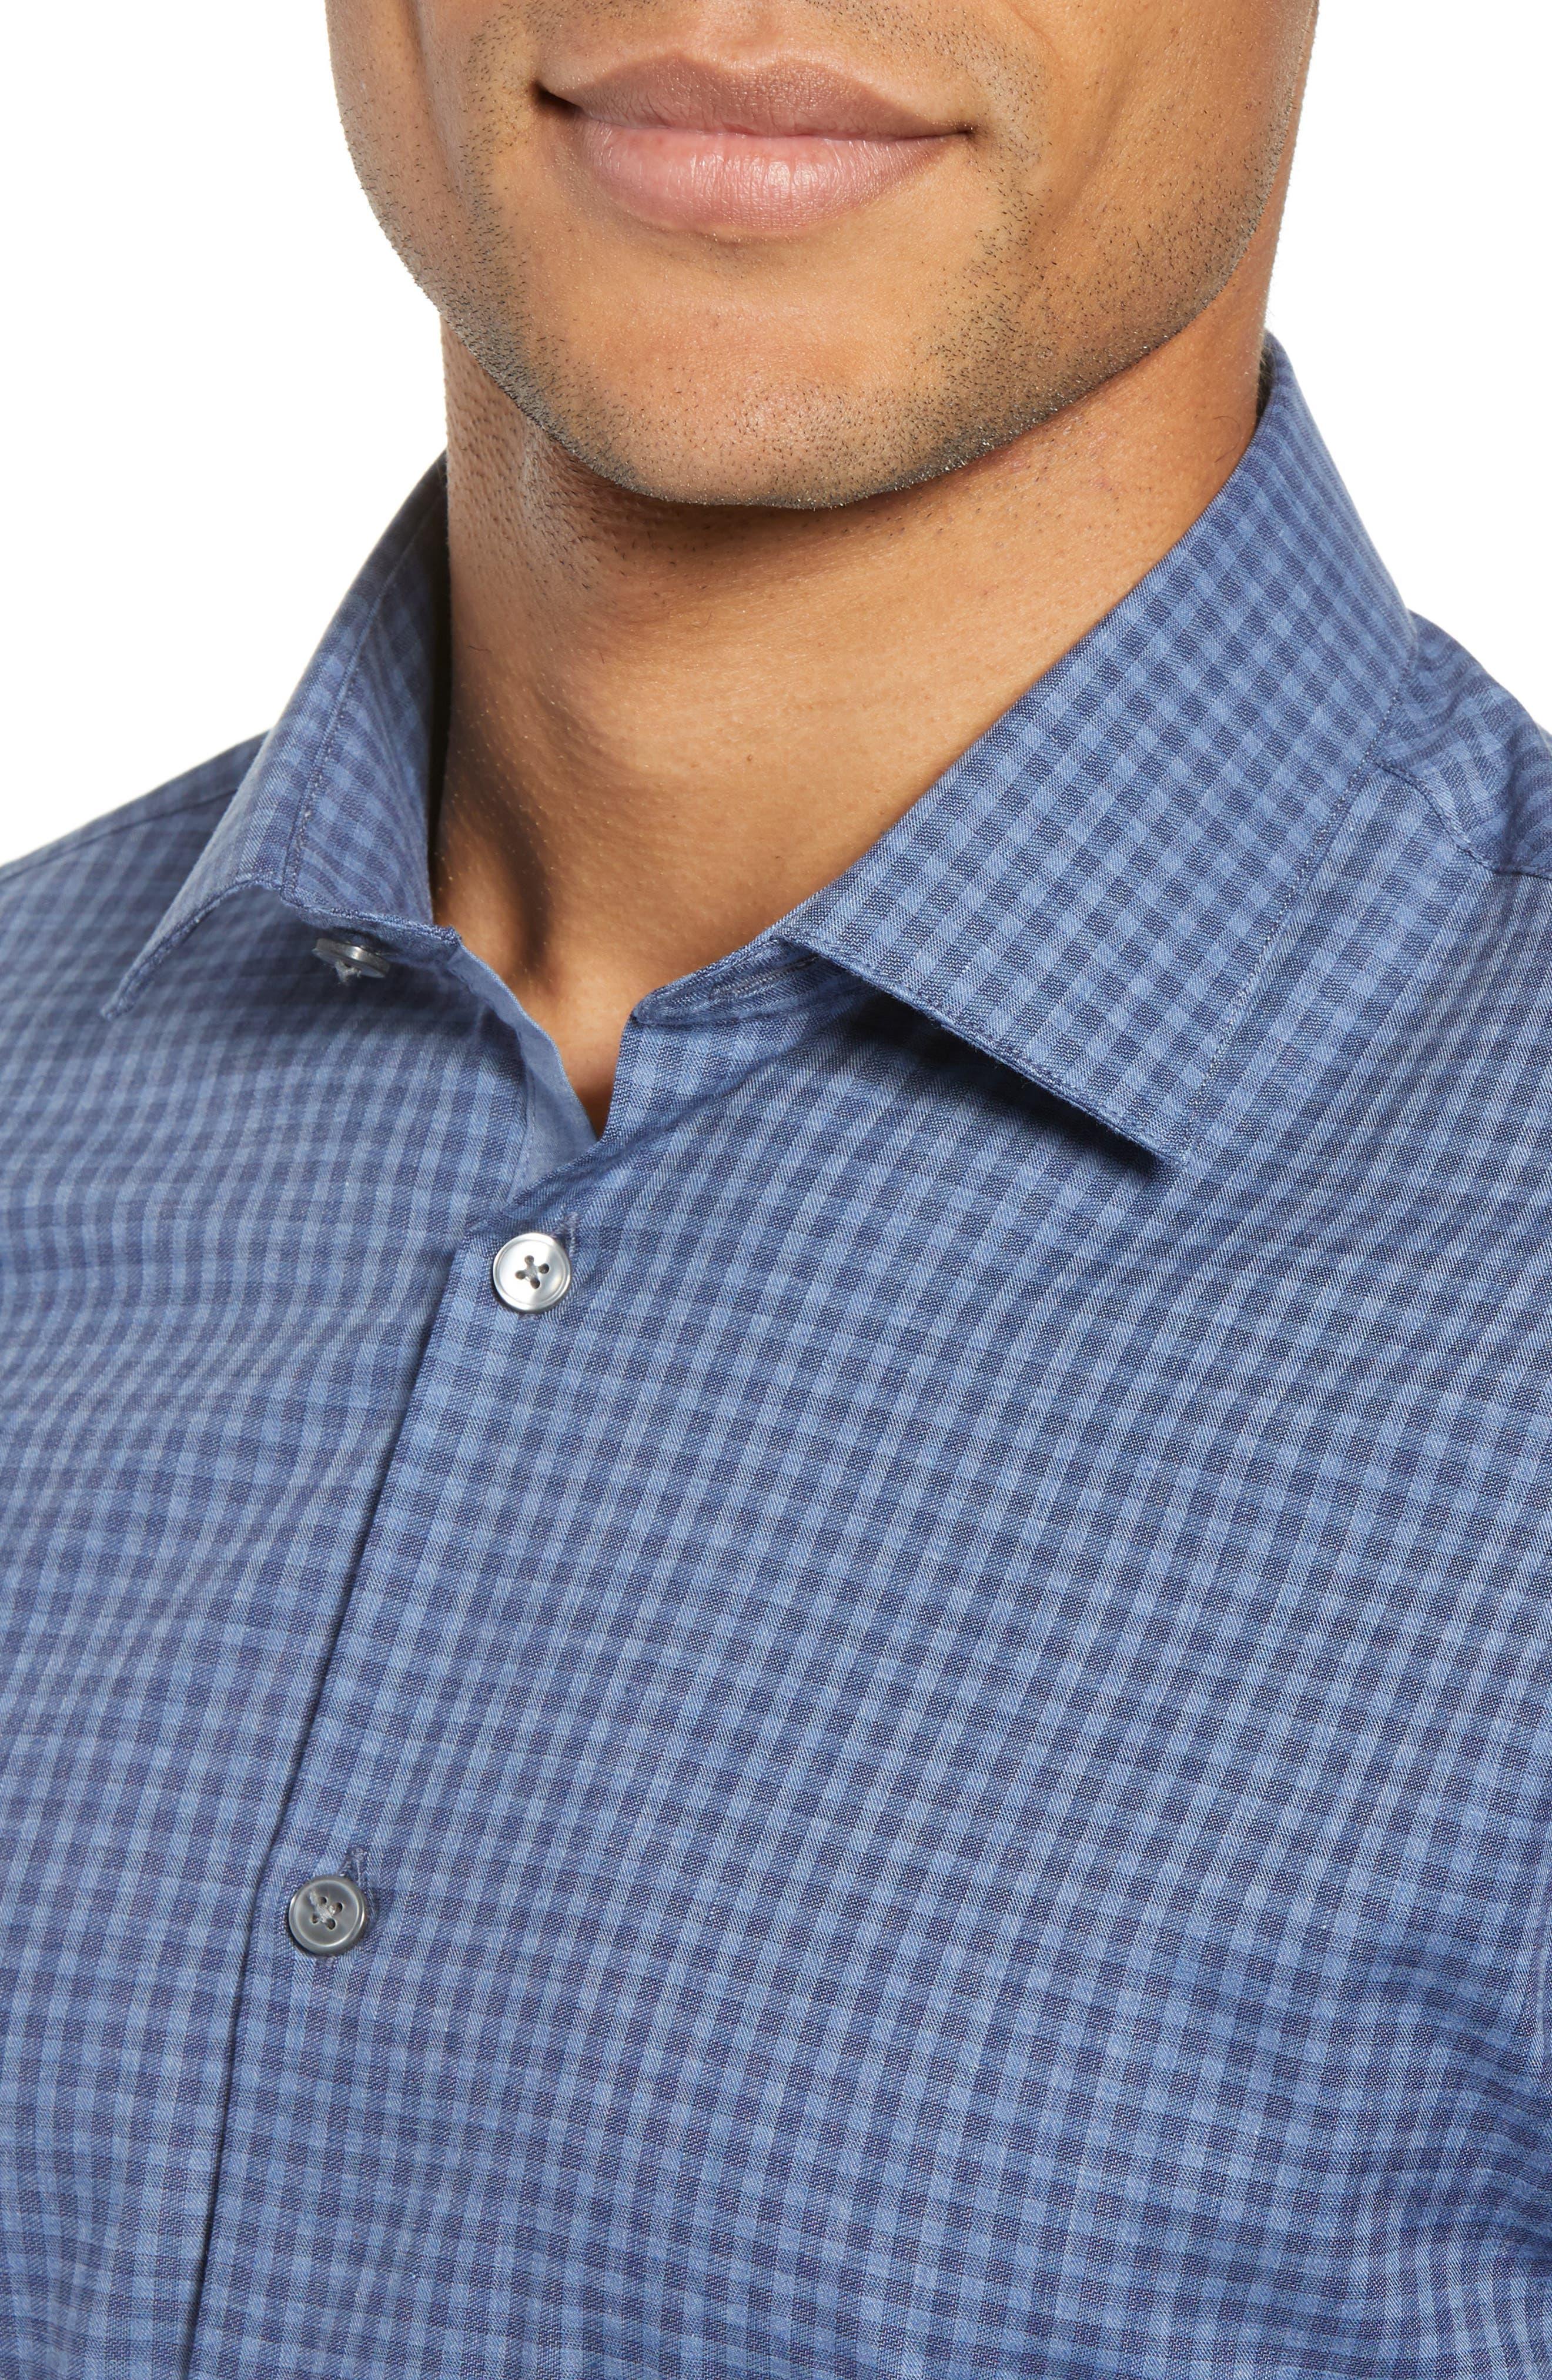 Slim Fit Check Dress Shirt,                             Alternate thumbnail 2, color,                             BLUE HEATHER